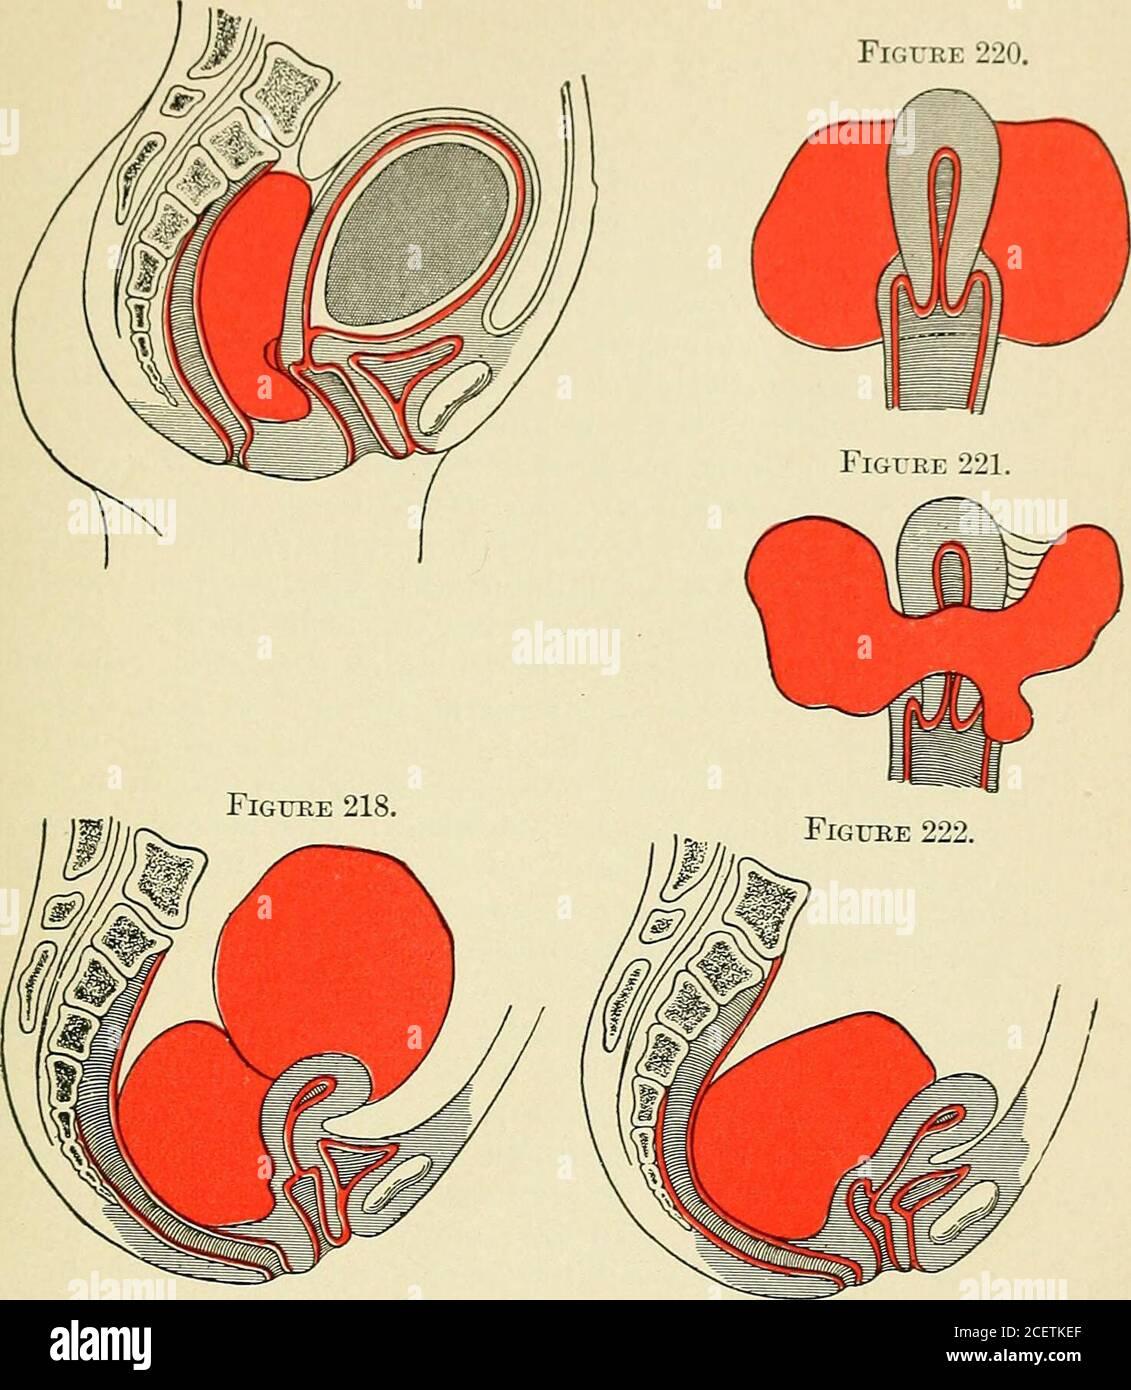 Cul-de-sac De Douglas : cul-de-sac, douglas, Principles, Practice, Gynecology, Students, Practitioners., Haematocele, Lifting, Peritoneum, Cul-de-sac, Douglas,, Extending, Broad, Ligaments., Easily